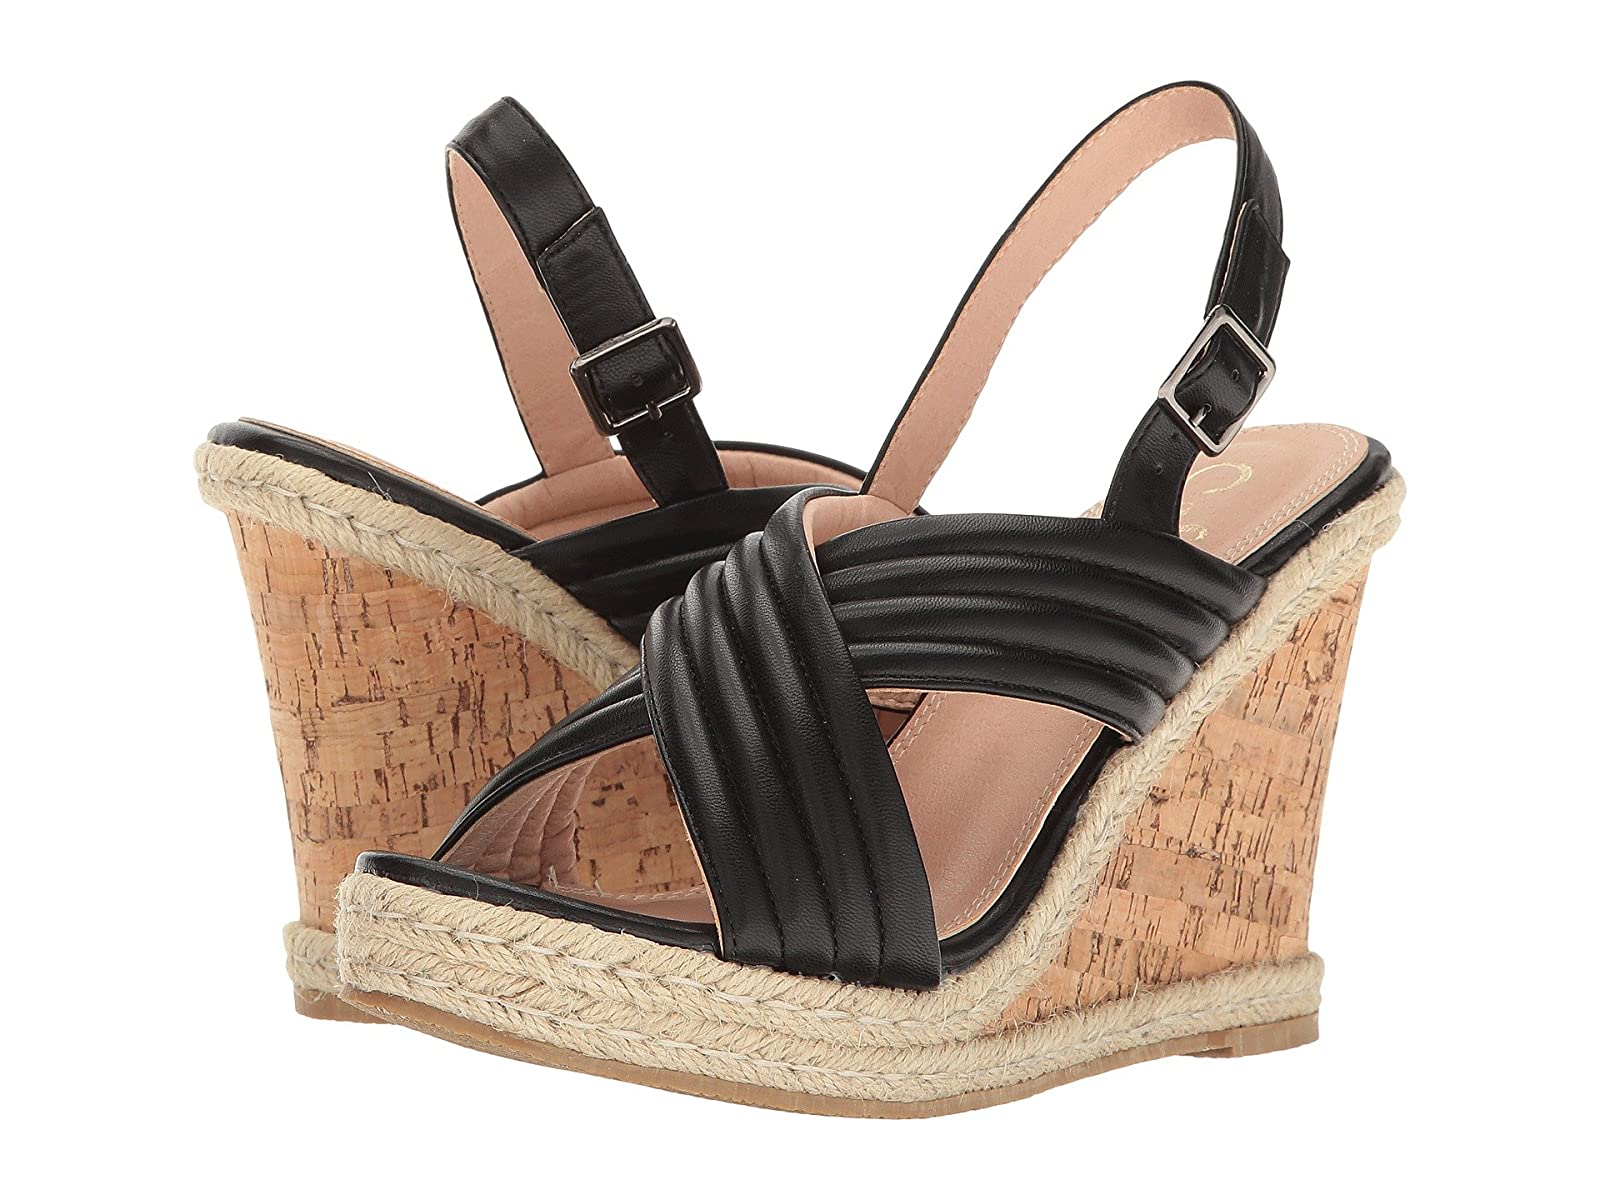 Callisto of California MalinCheap and distinctive eye-catching shoes